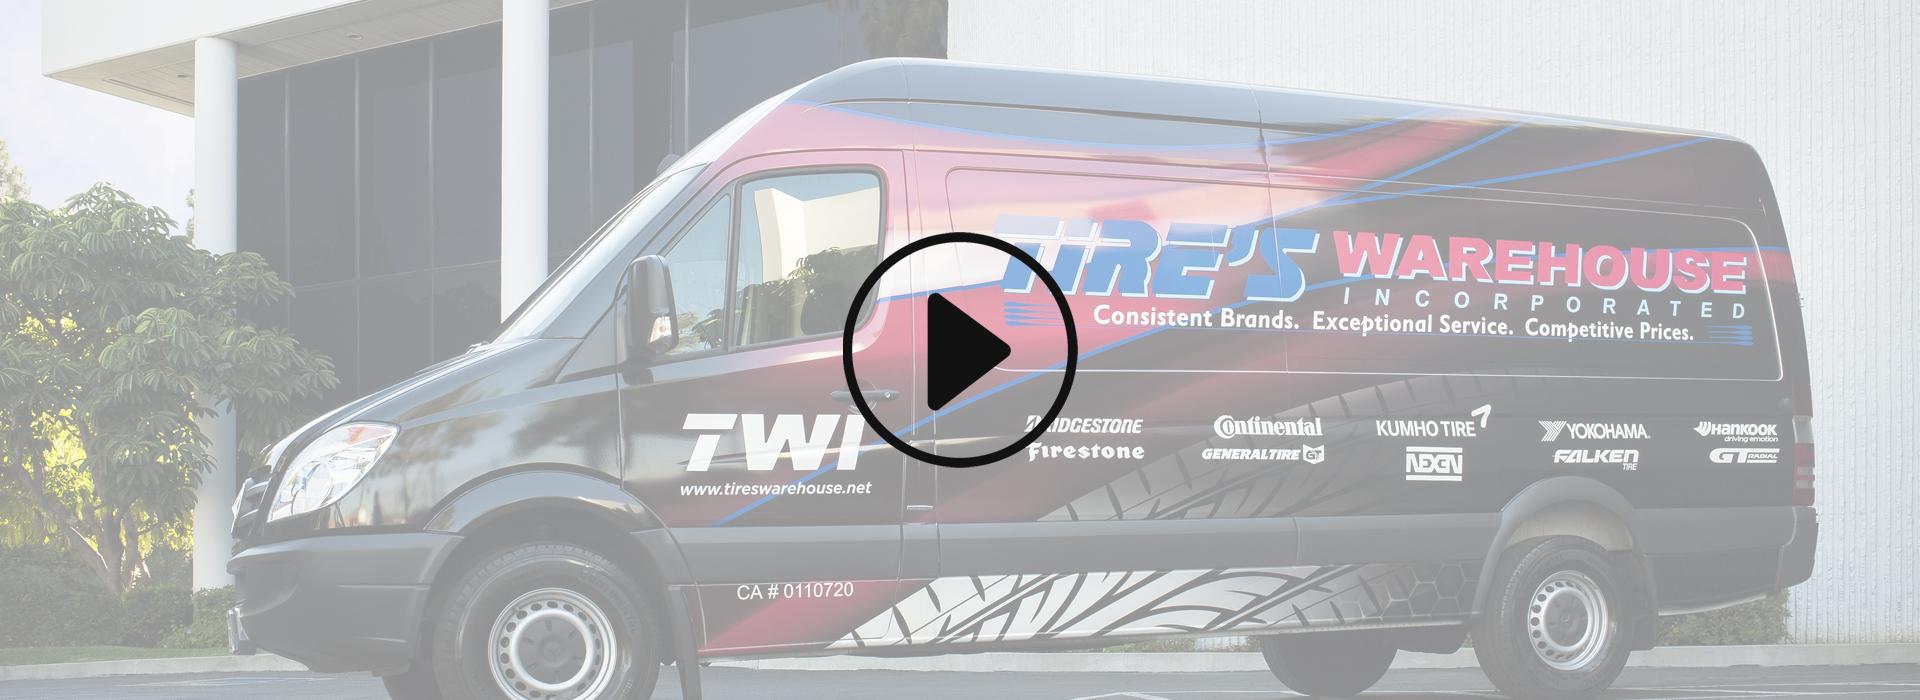 Tire's Warehouse